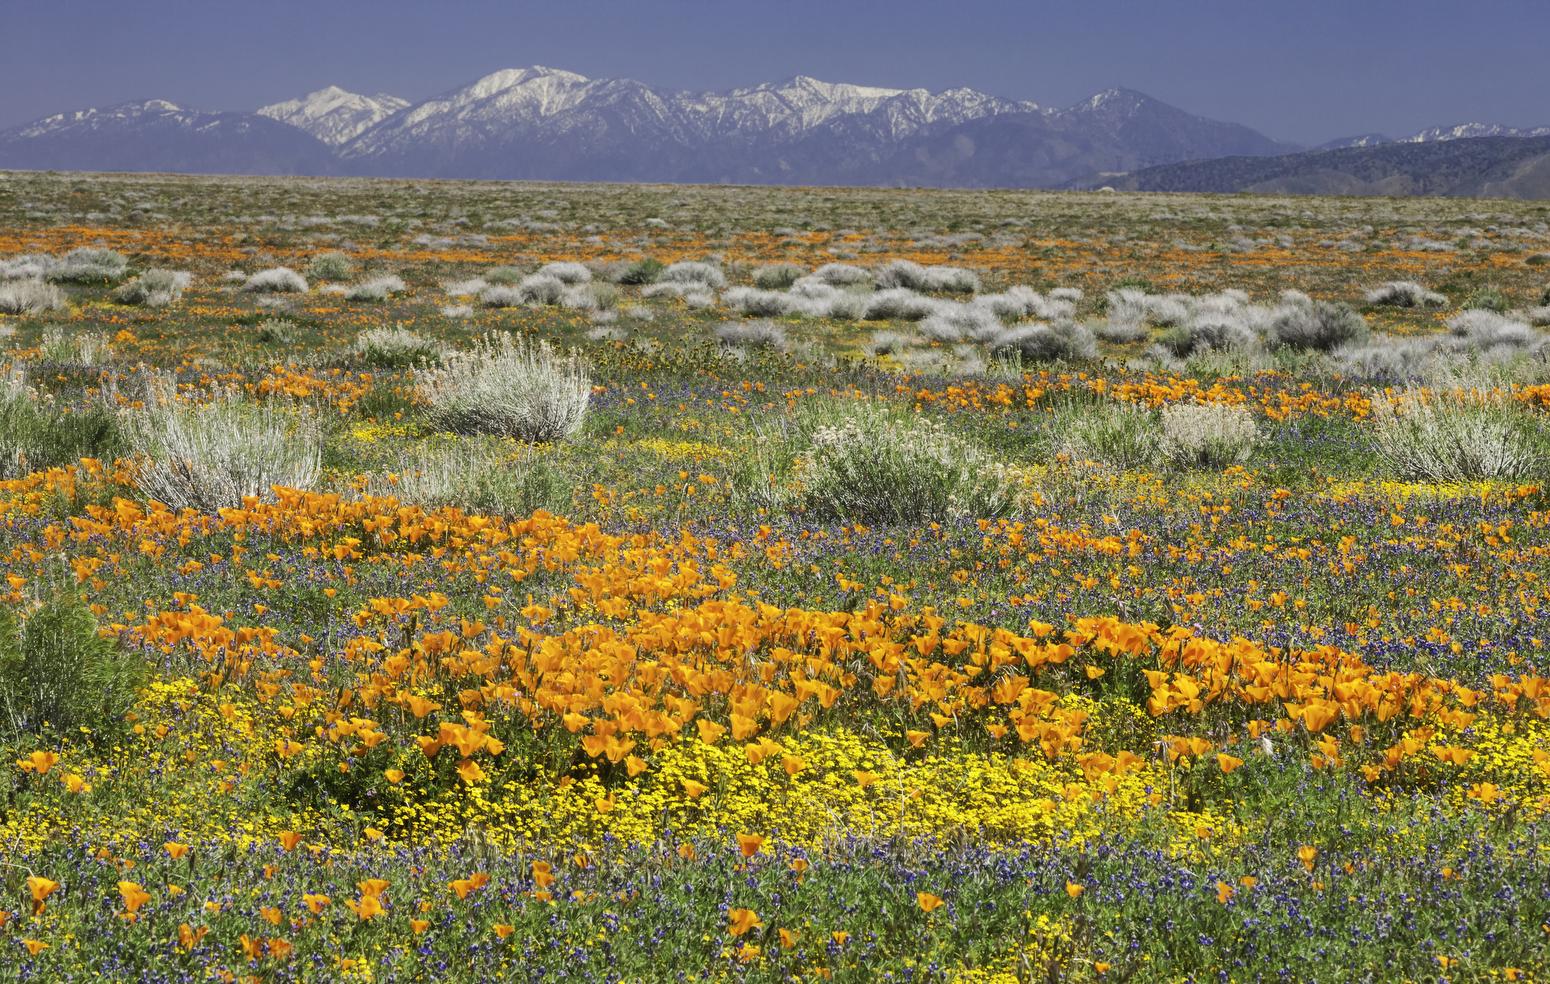 Field of wildflowers, California Poppy